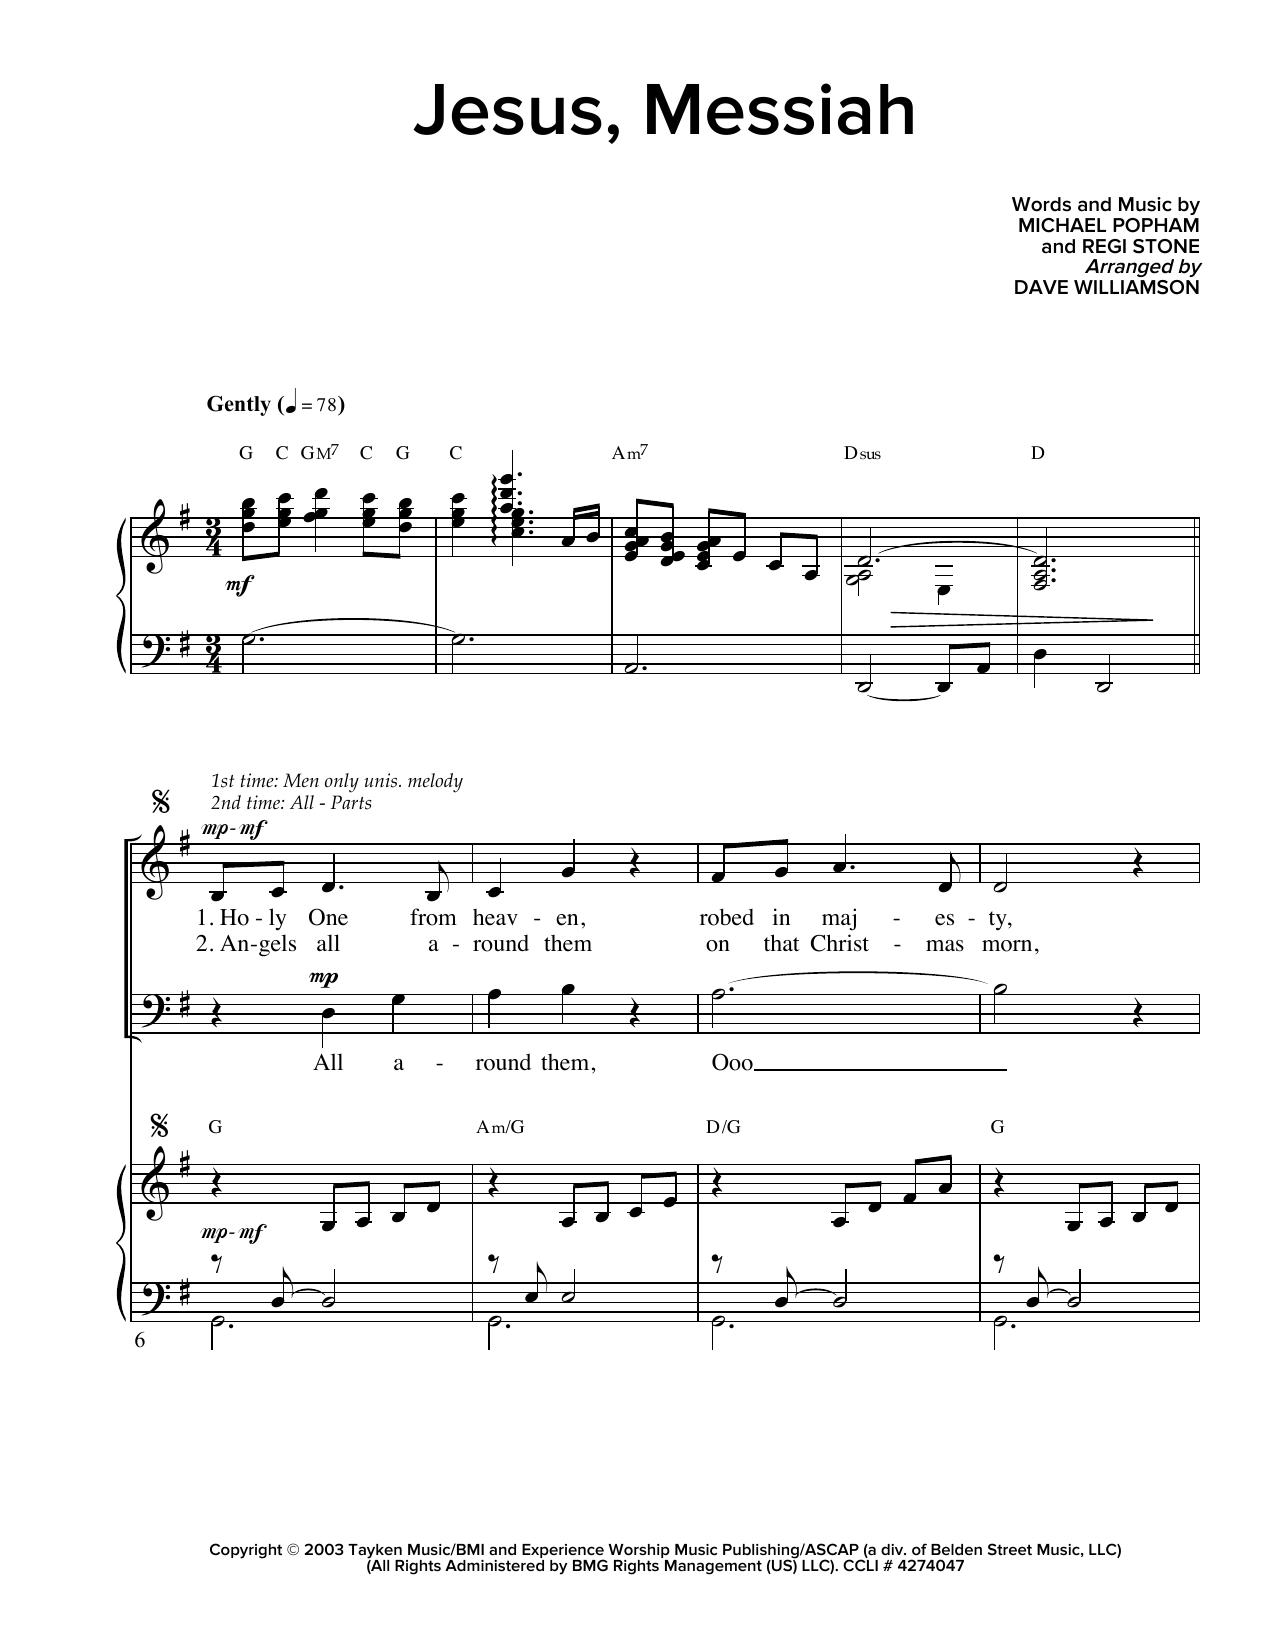 Sheet Music Digital Files To Print Licensed Michael Popham Piano Parts Diagram Jesus Messiah